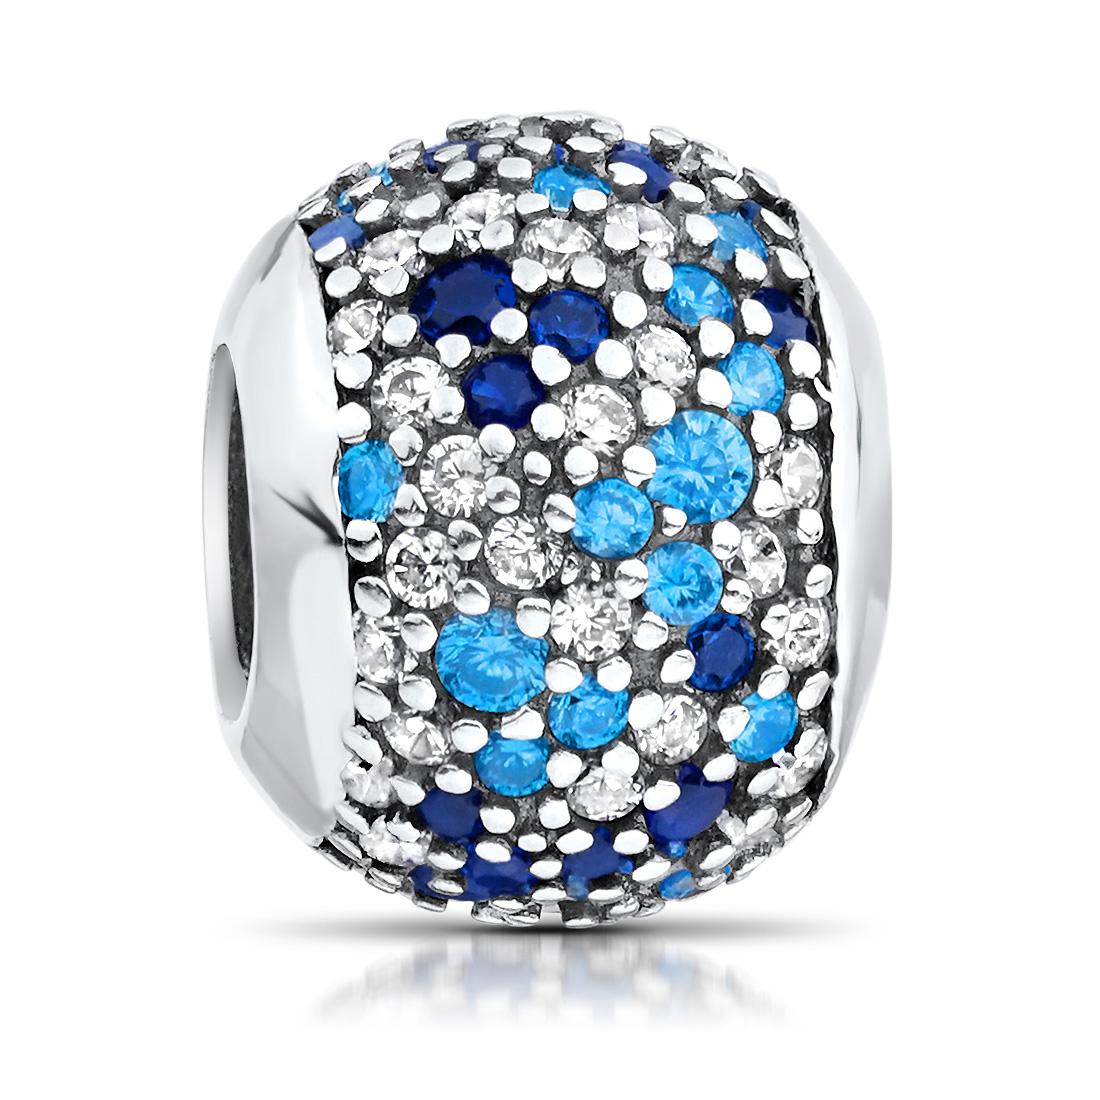 MATERIA Damen Charms  Perle 925 Silber Kugel Zirkonia blau weiß